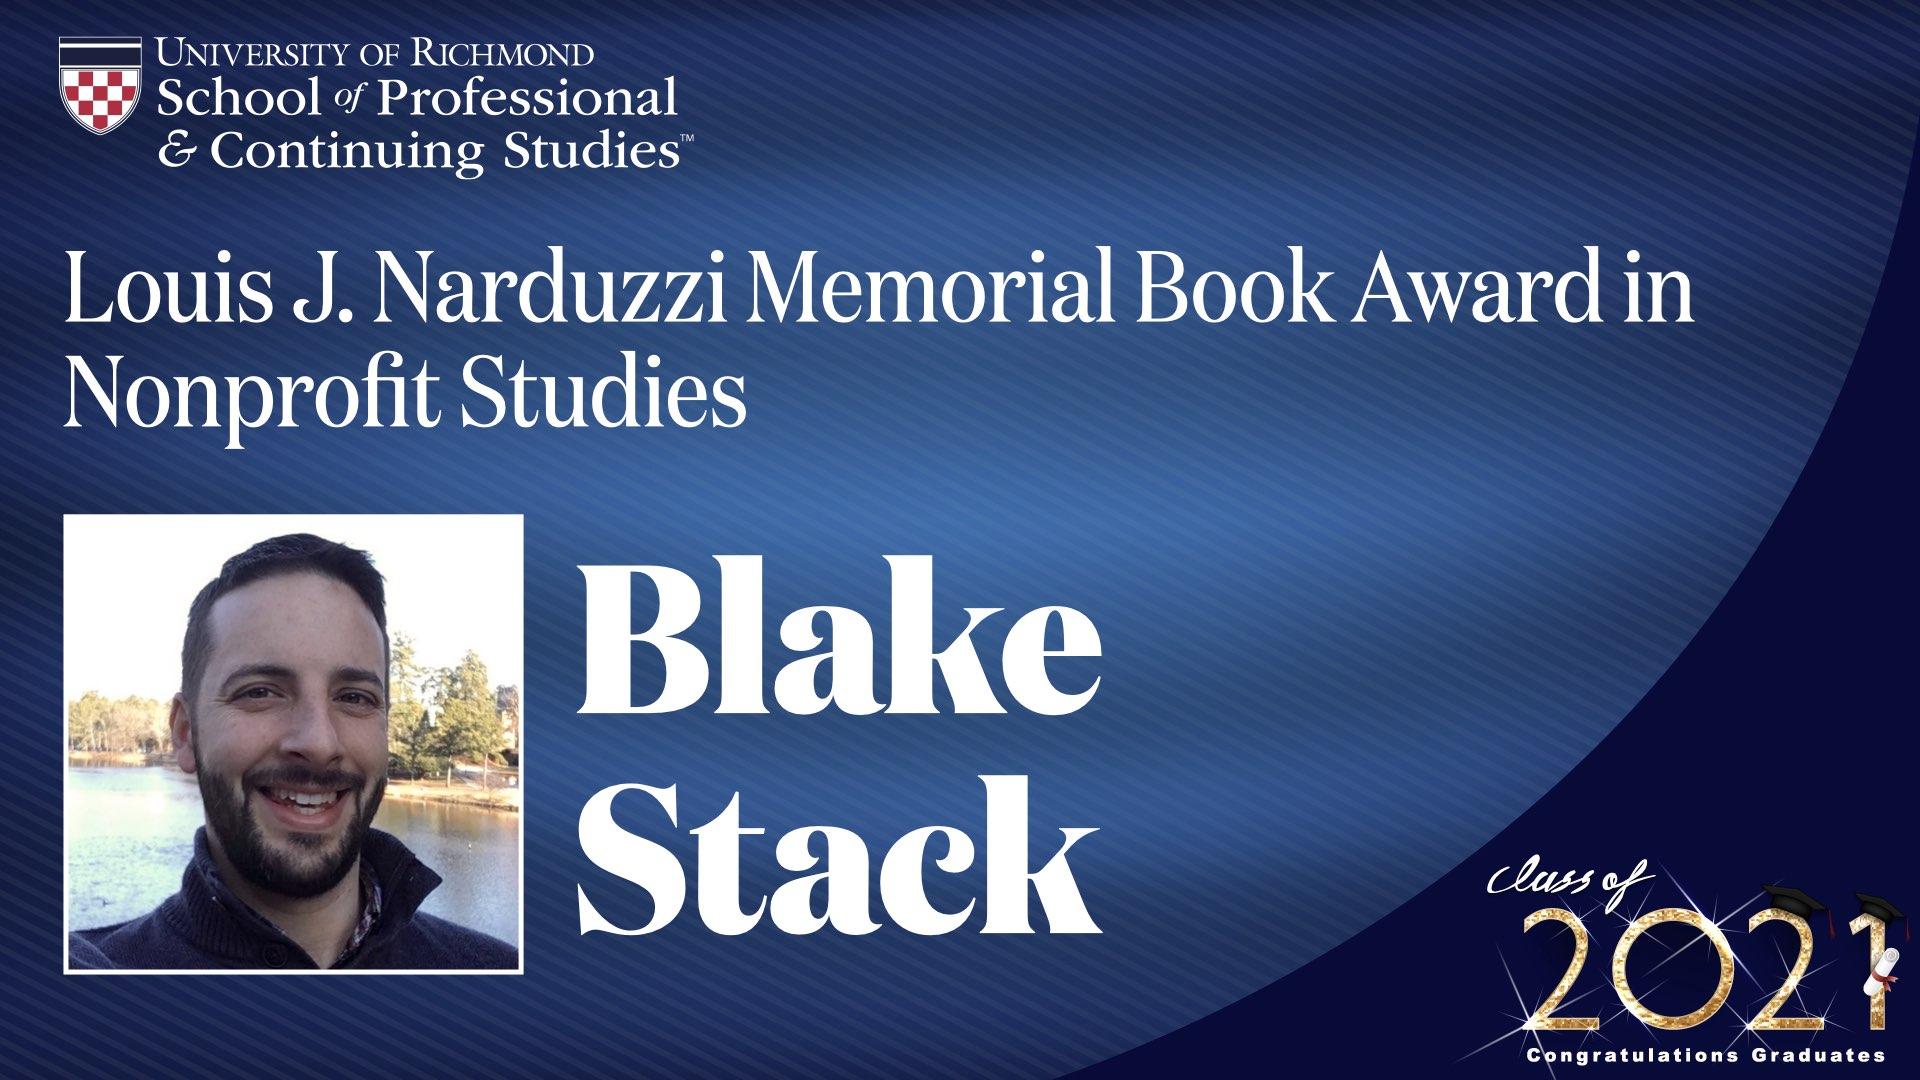 Blake Stack headshot and award name